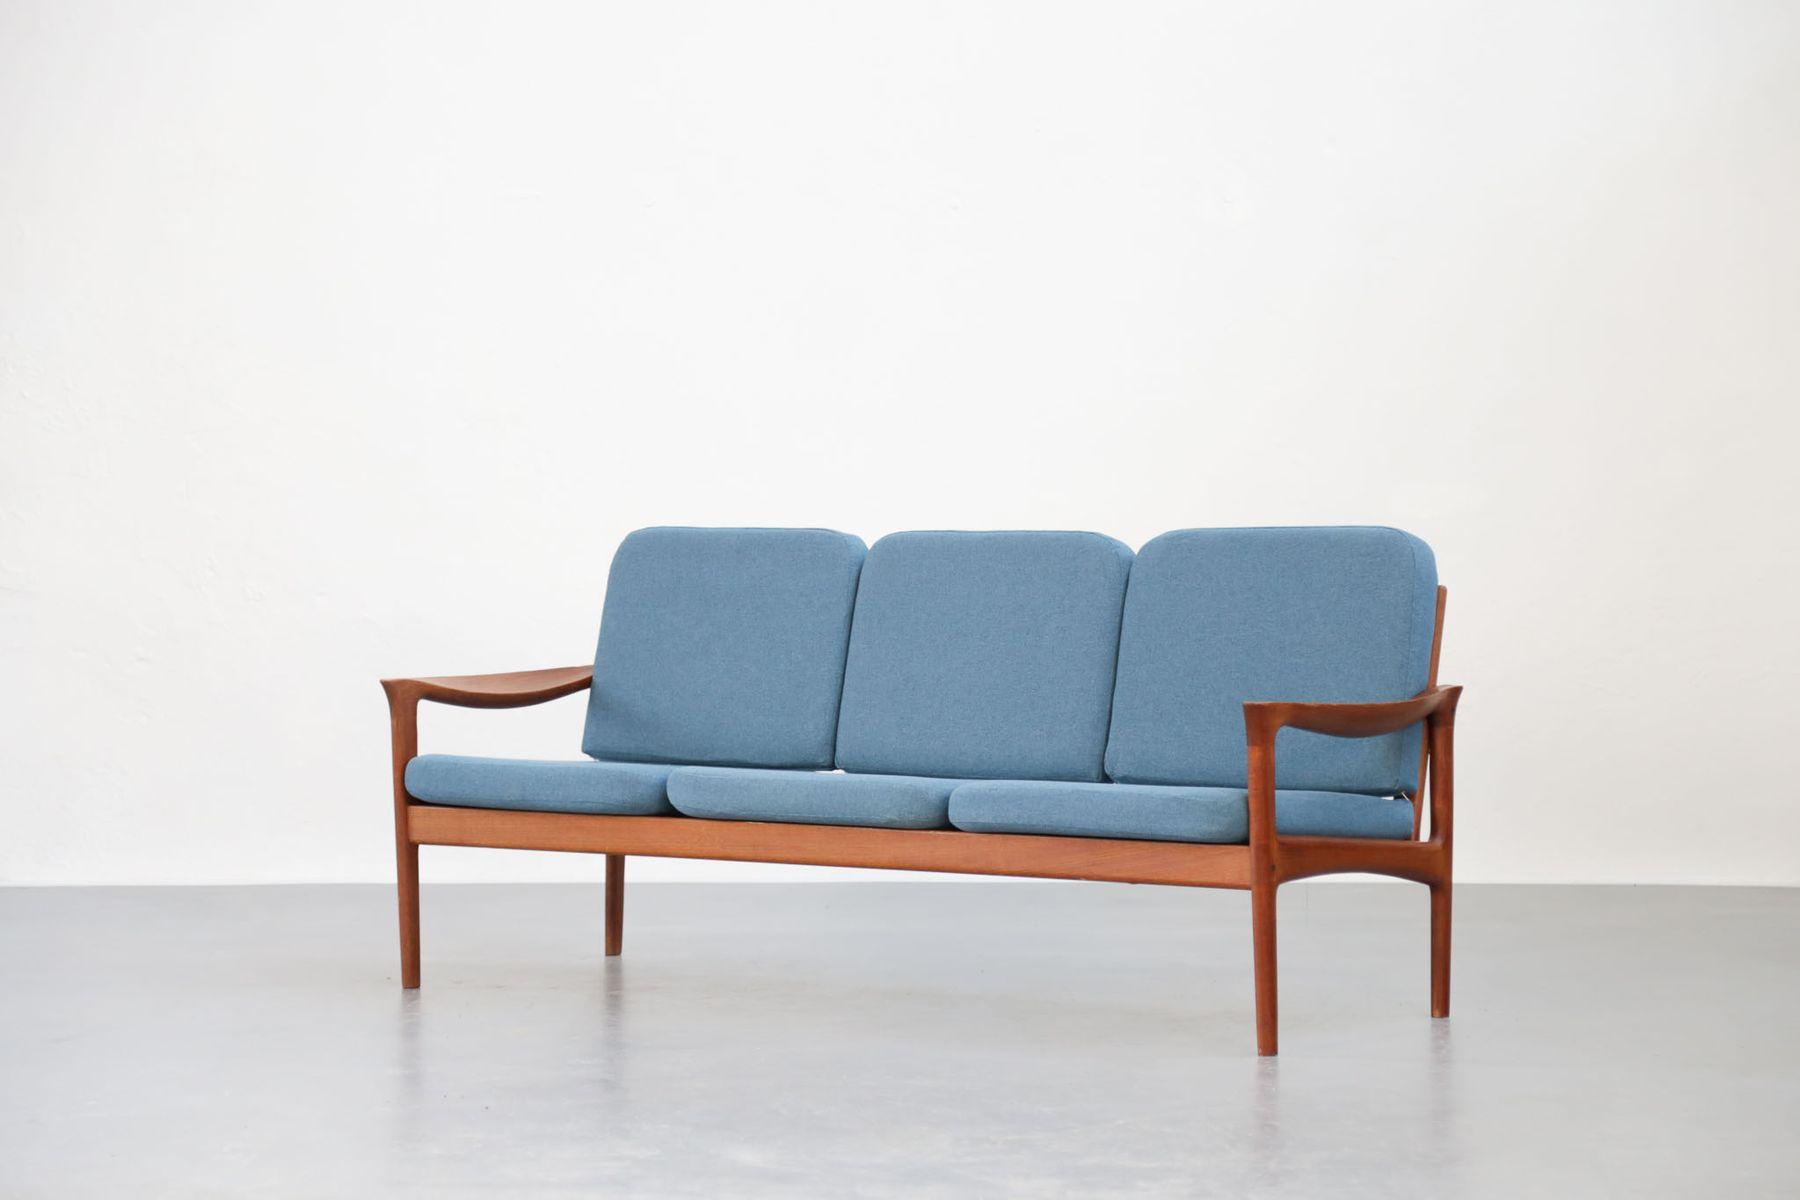 canap en teck tissu bleu danemark 1960s en vente sur. Black Bedroom Furniture Sets. Home Design Ideas